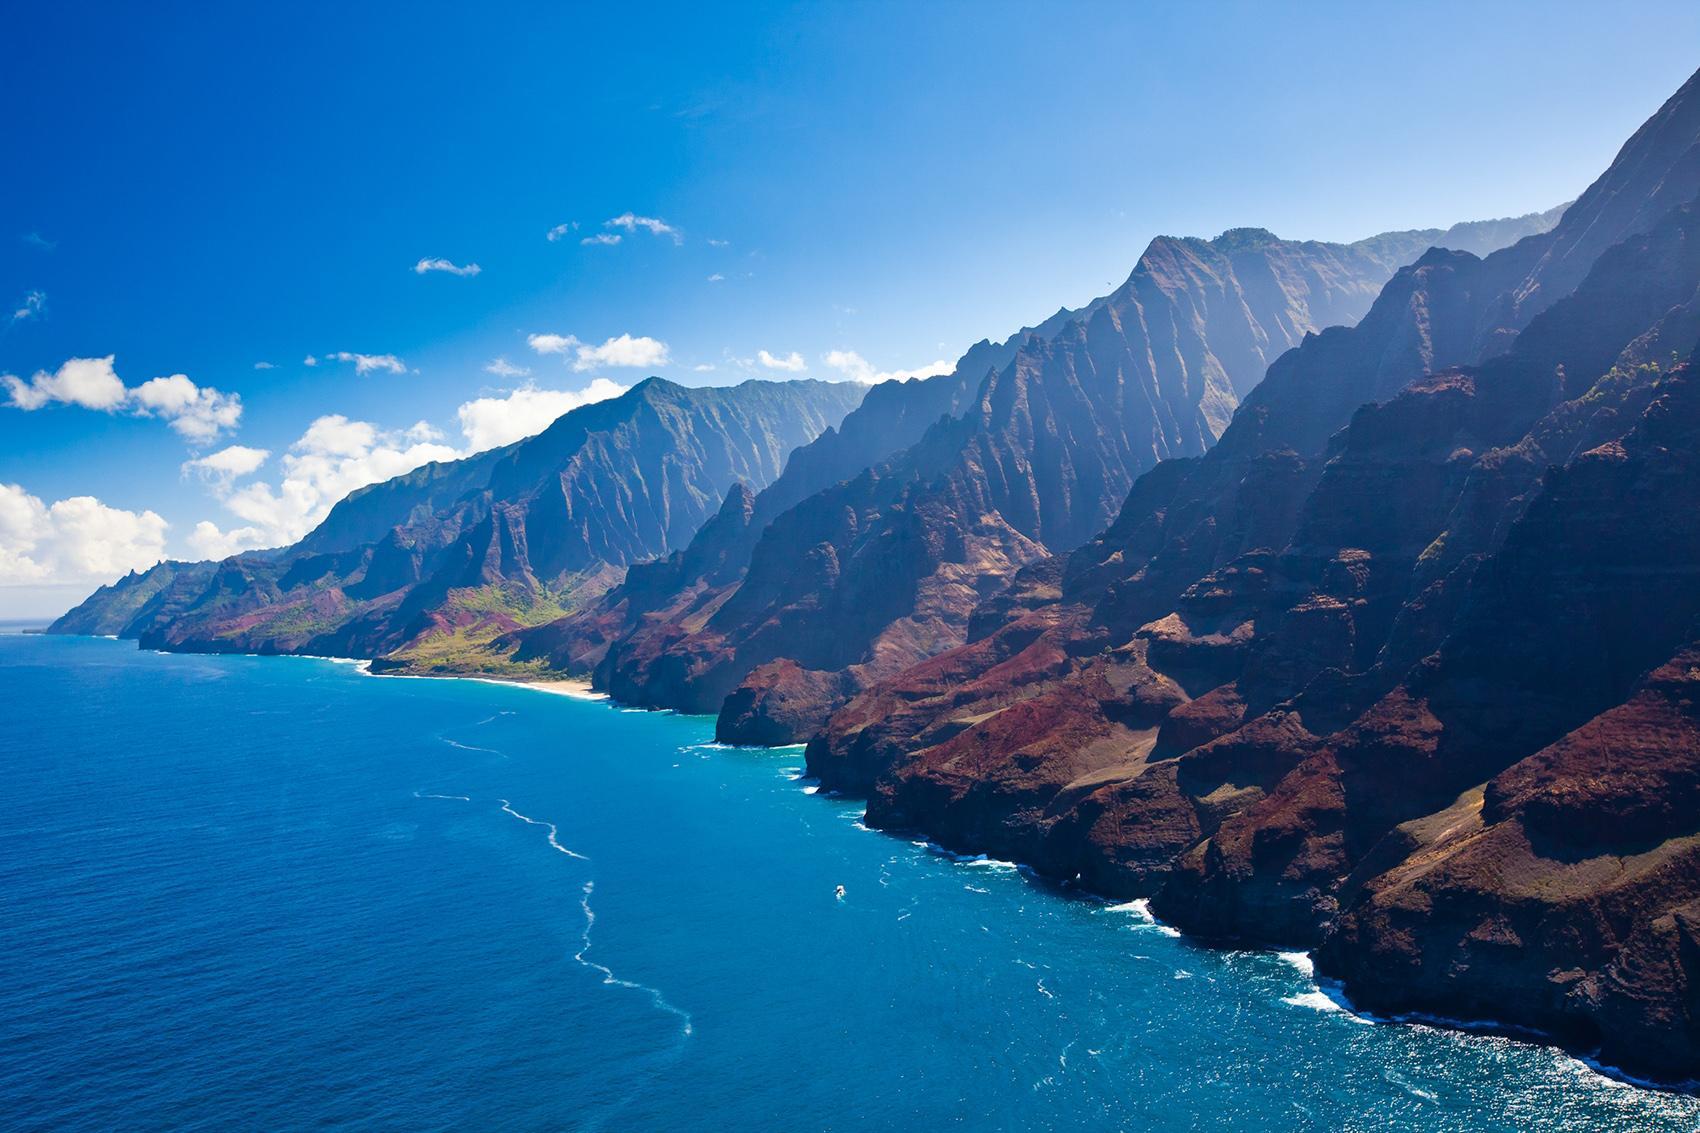 Kauai Napali Coast Hawaii